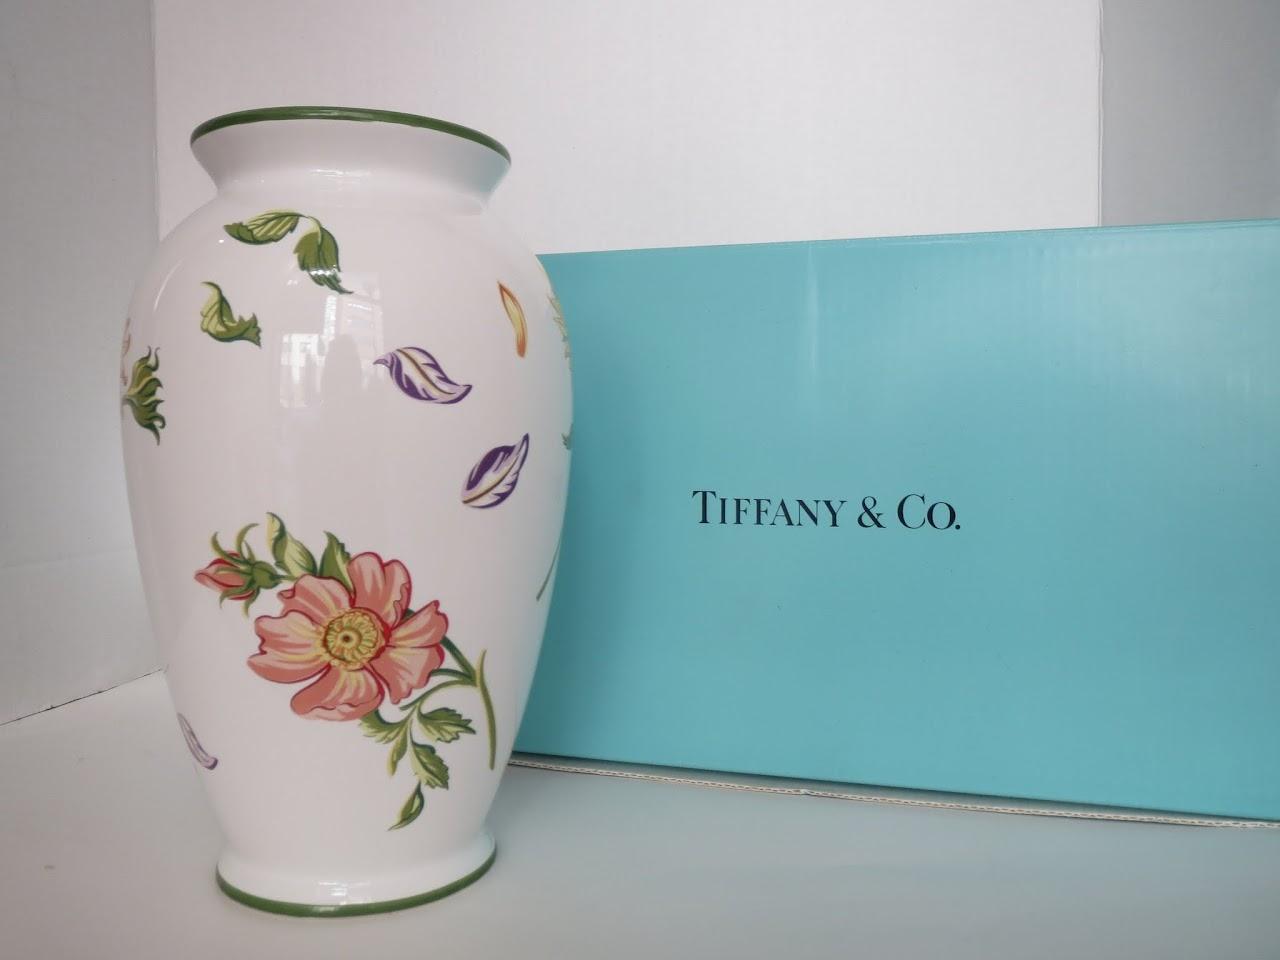 Tiffany co tiffany petals vase shophousingworks reviewsmspy